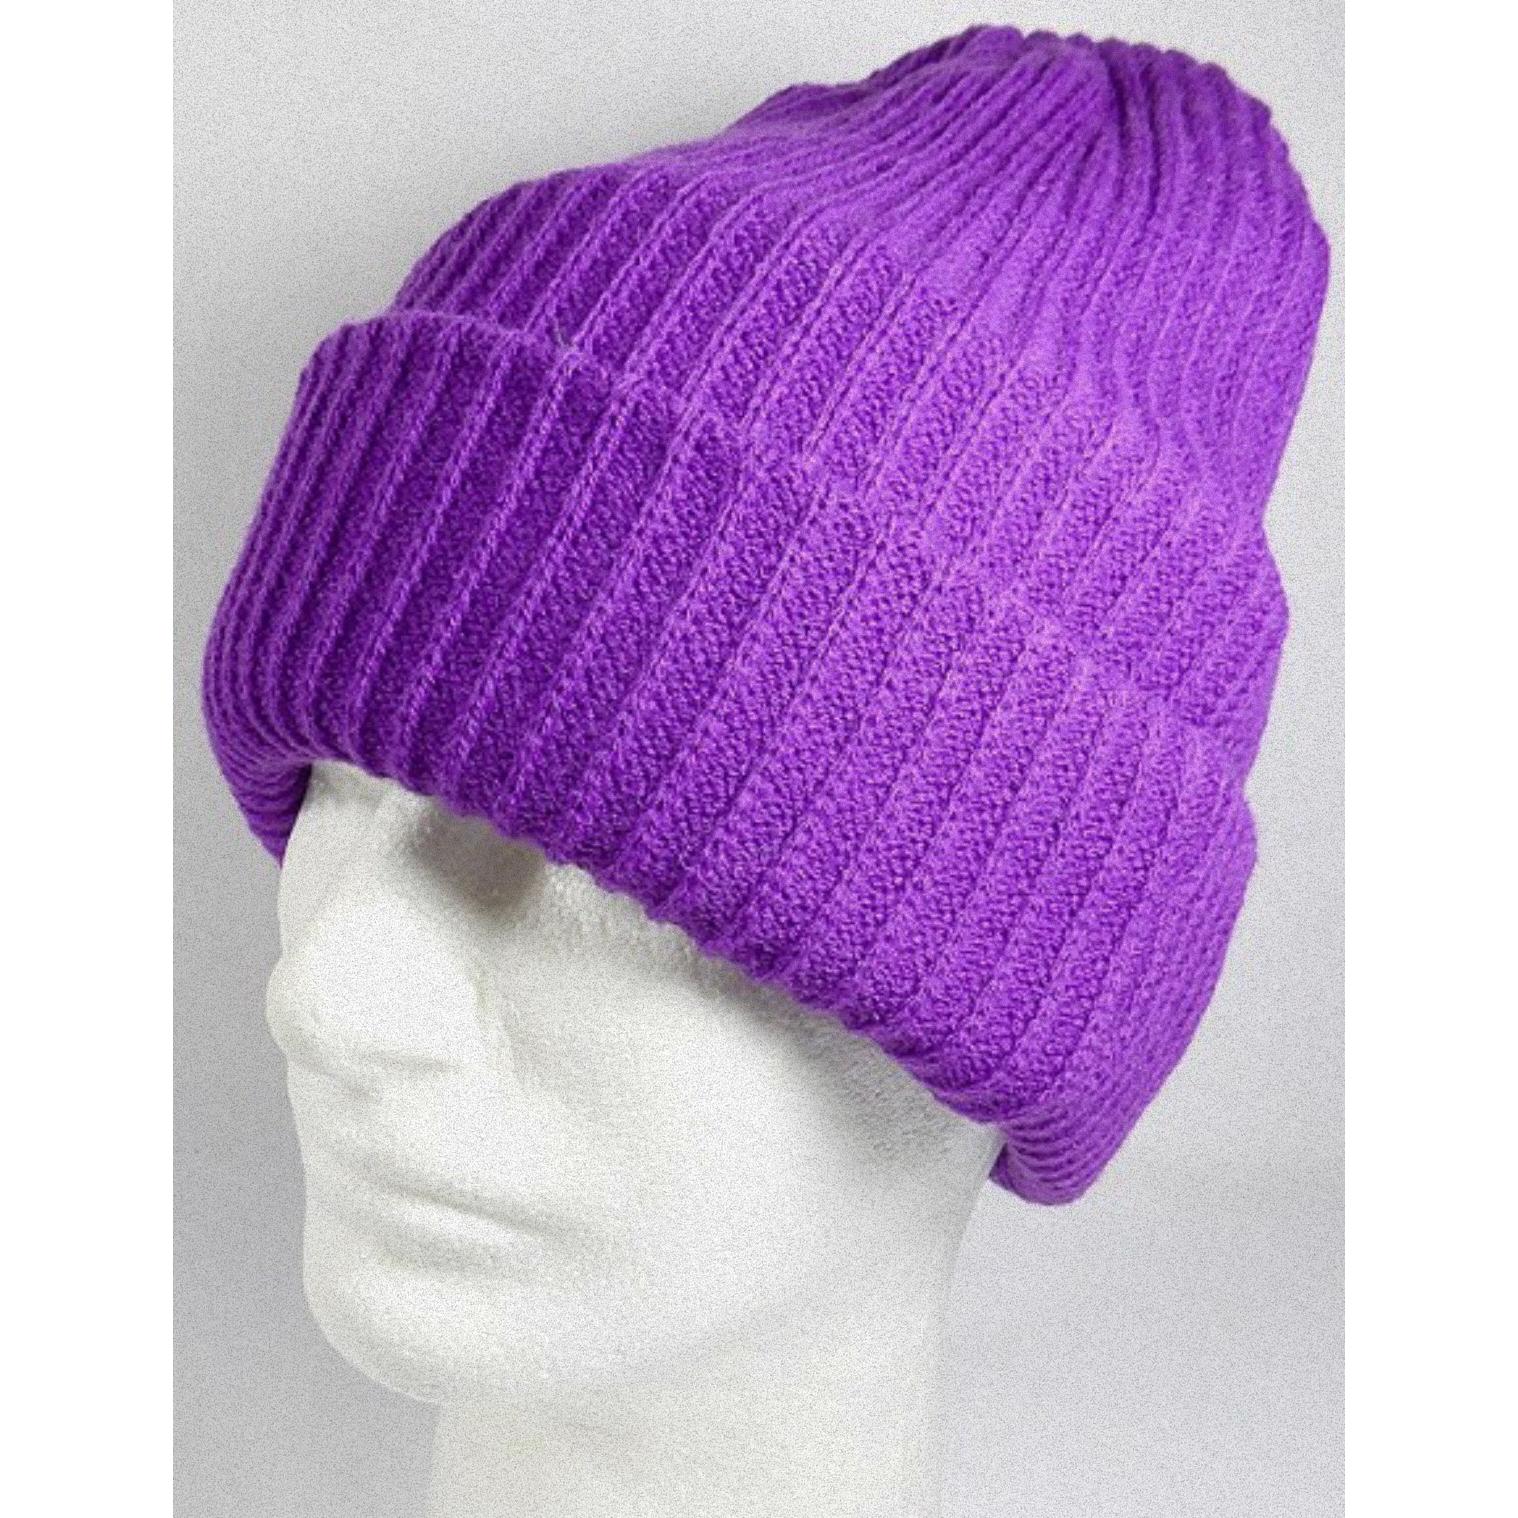 Signature Purple Wool Beanie